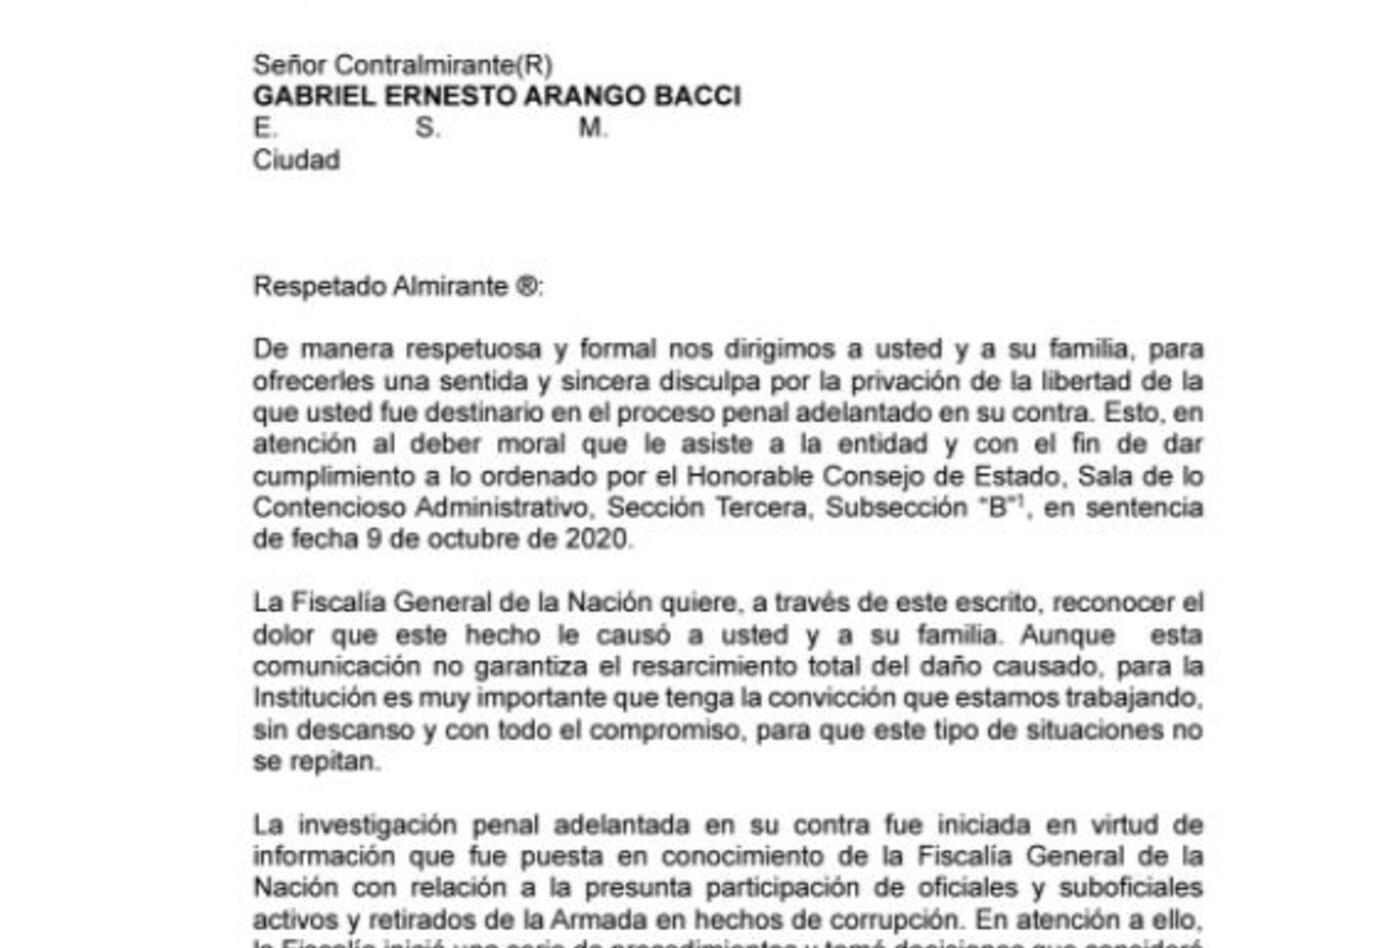 ARANGO BACCI